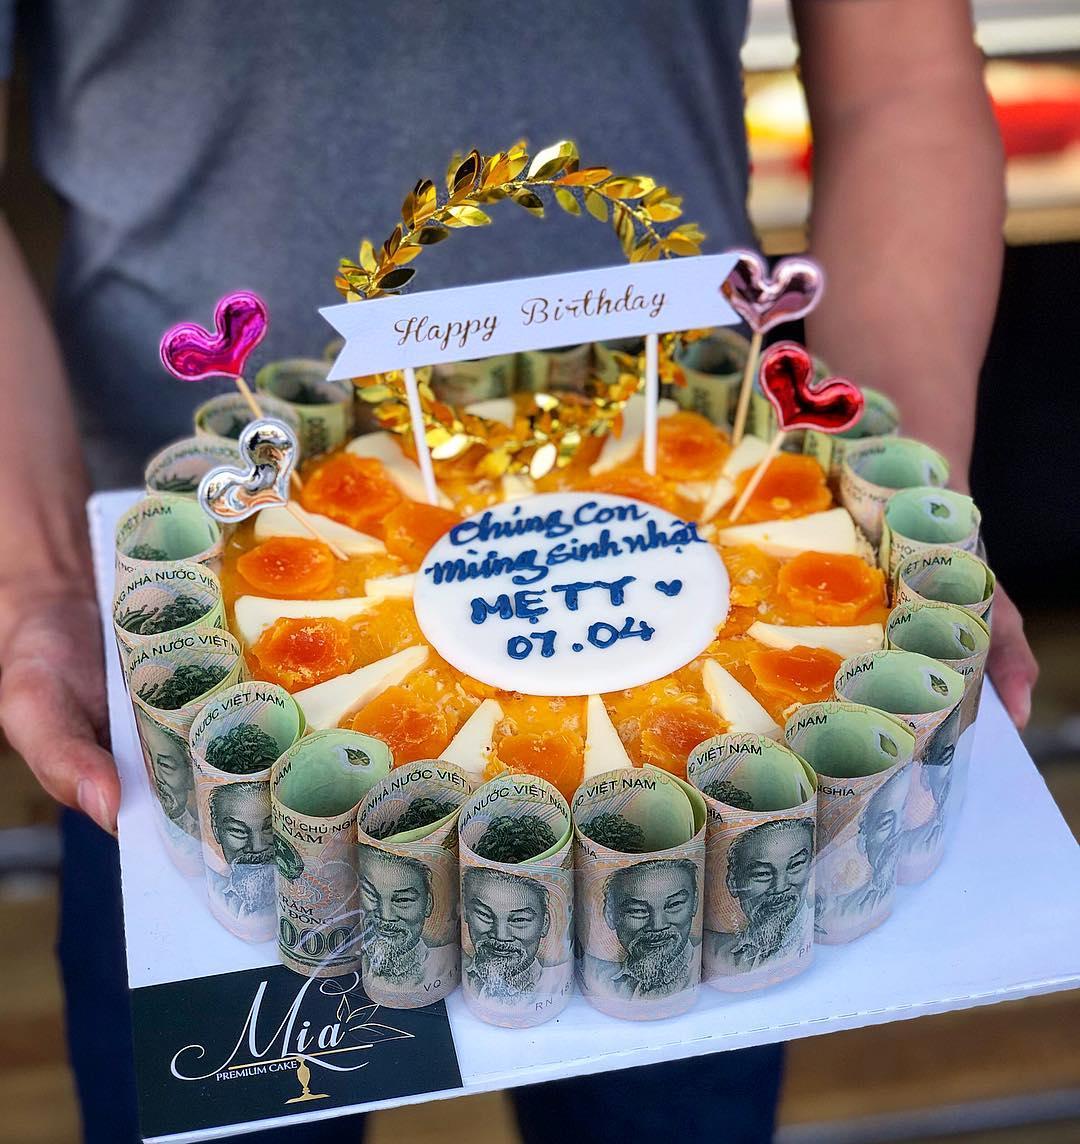 đà nẵng bakeries - miacake money birthday cake